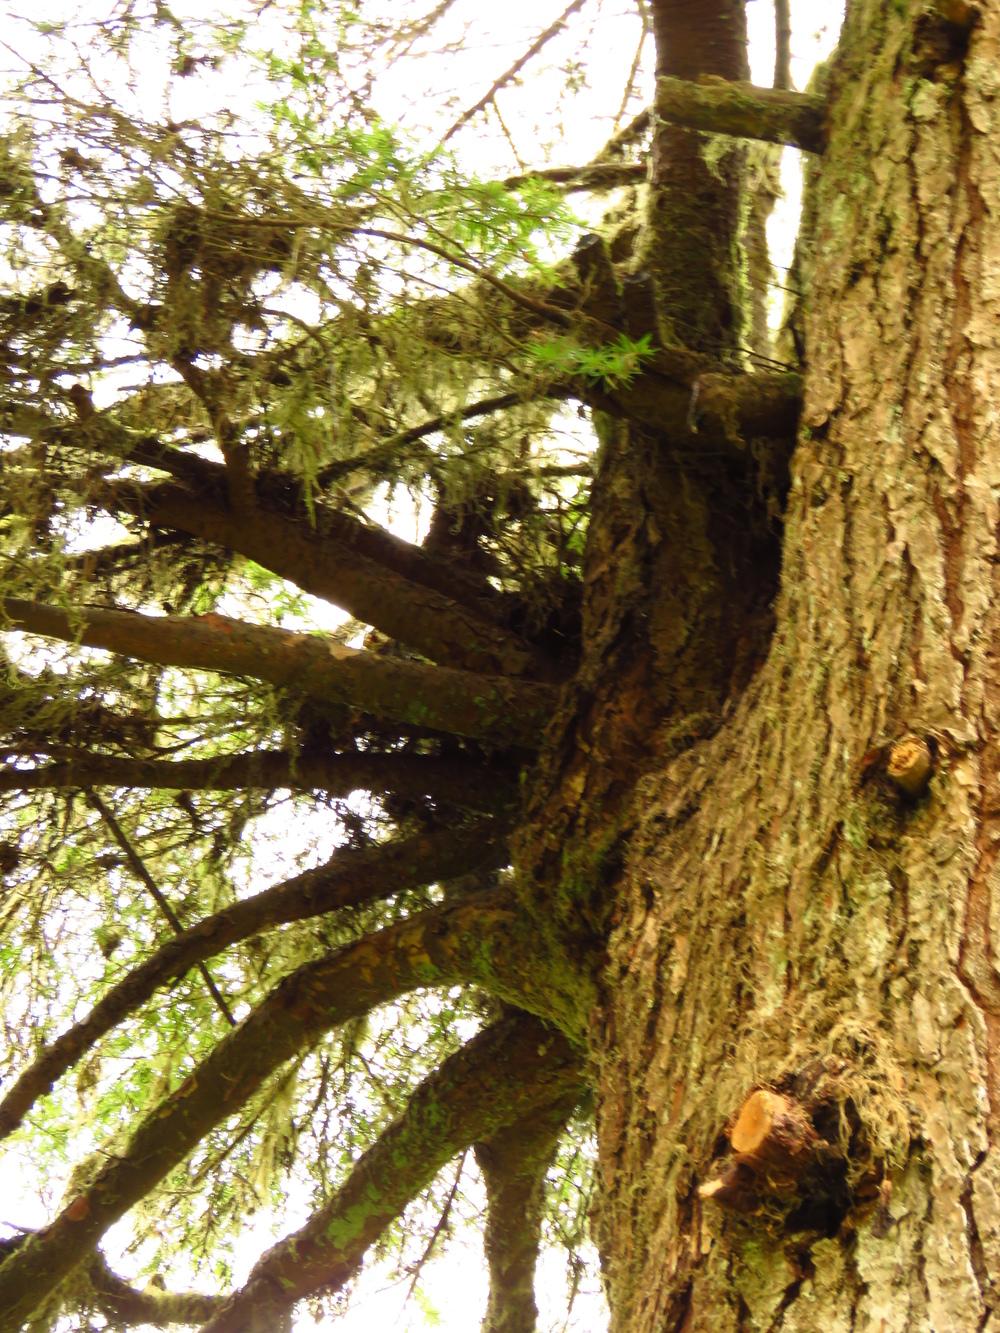 Focus On Hemlock Dwarf Mistletoe Snohomish Conservation District